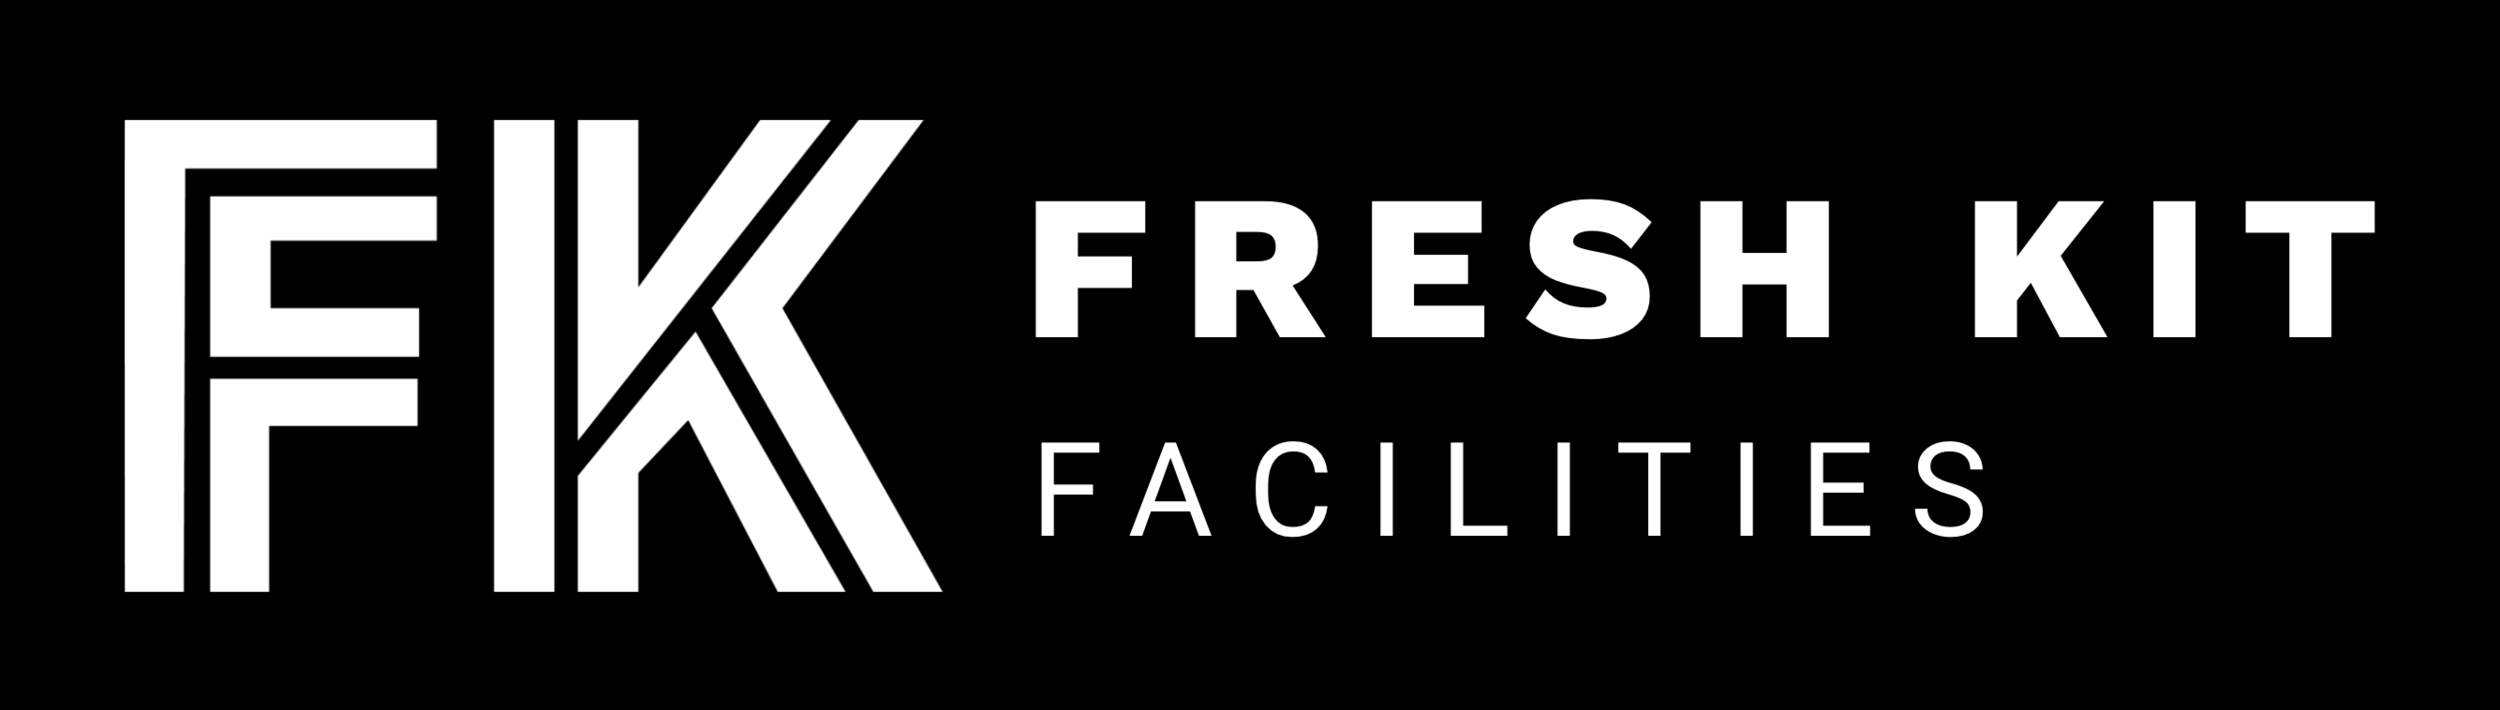 Fresh Kit - Facilities white logo